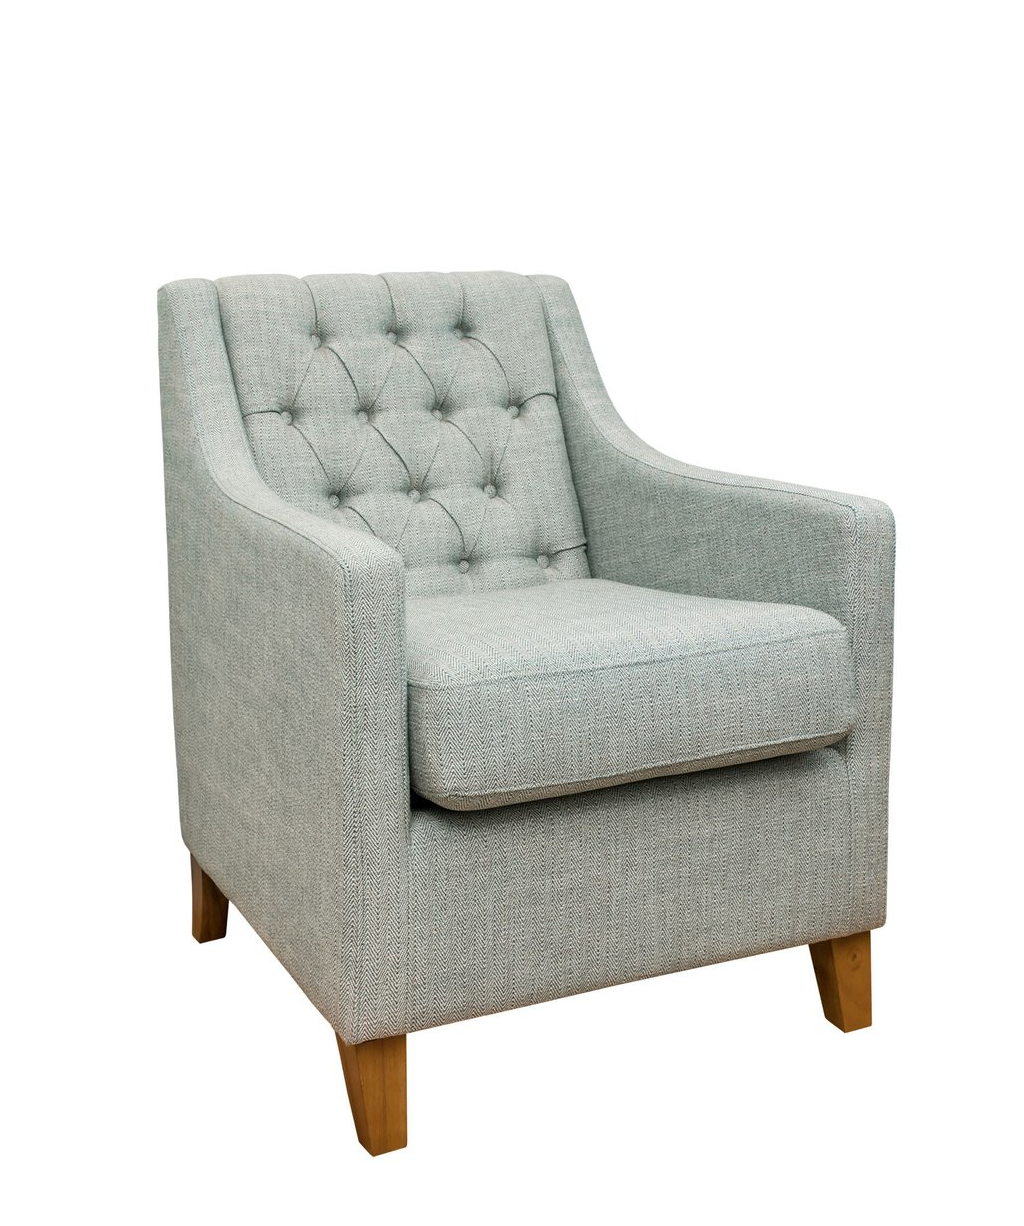 walton club chair